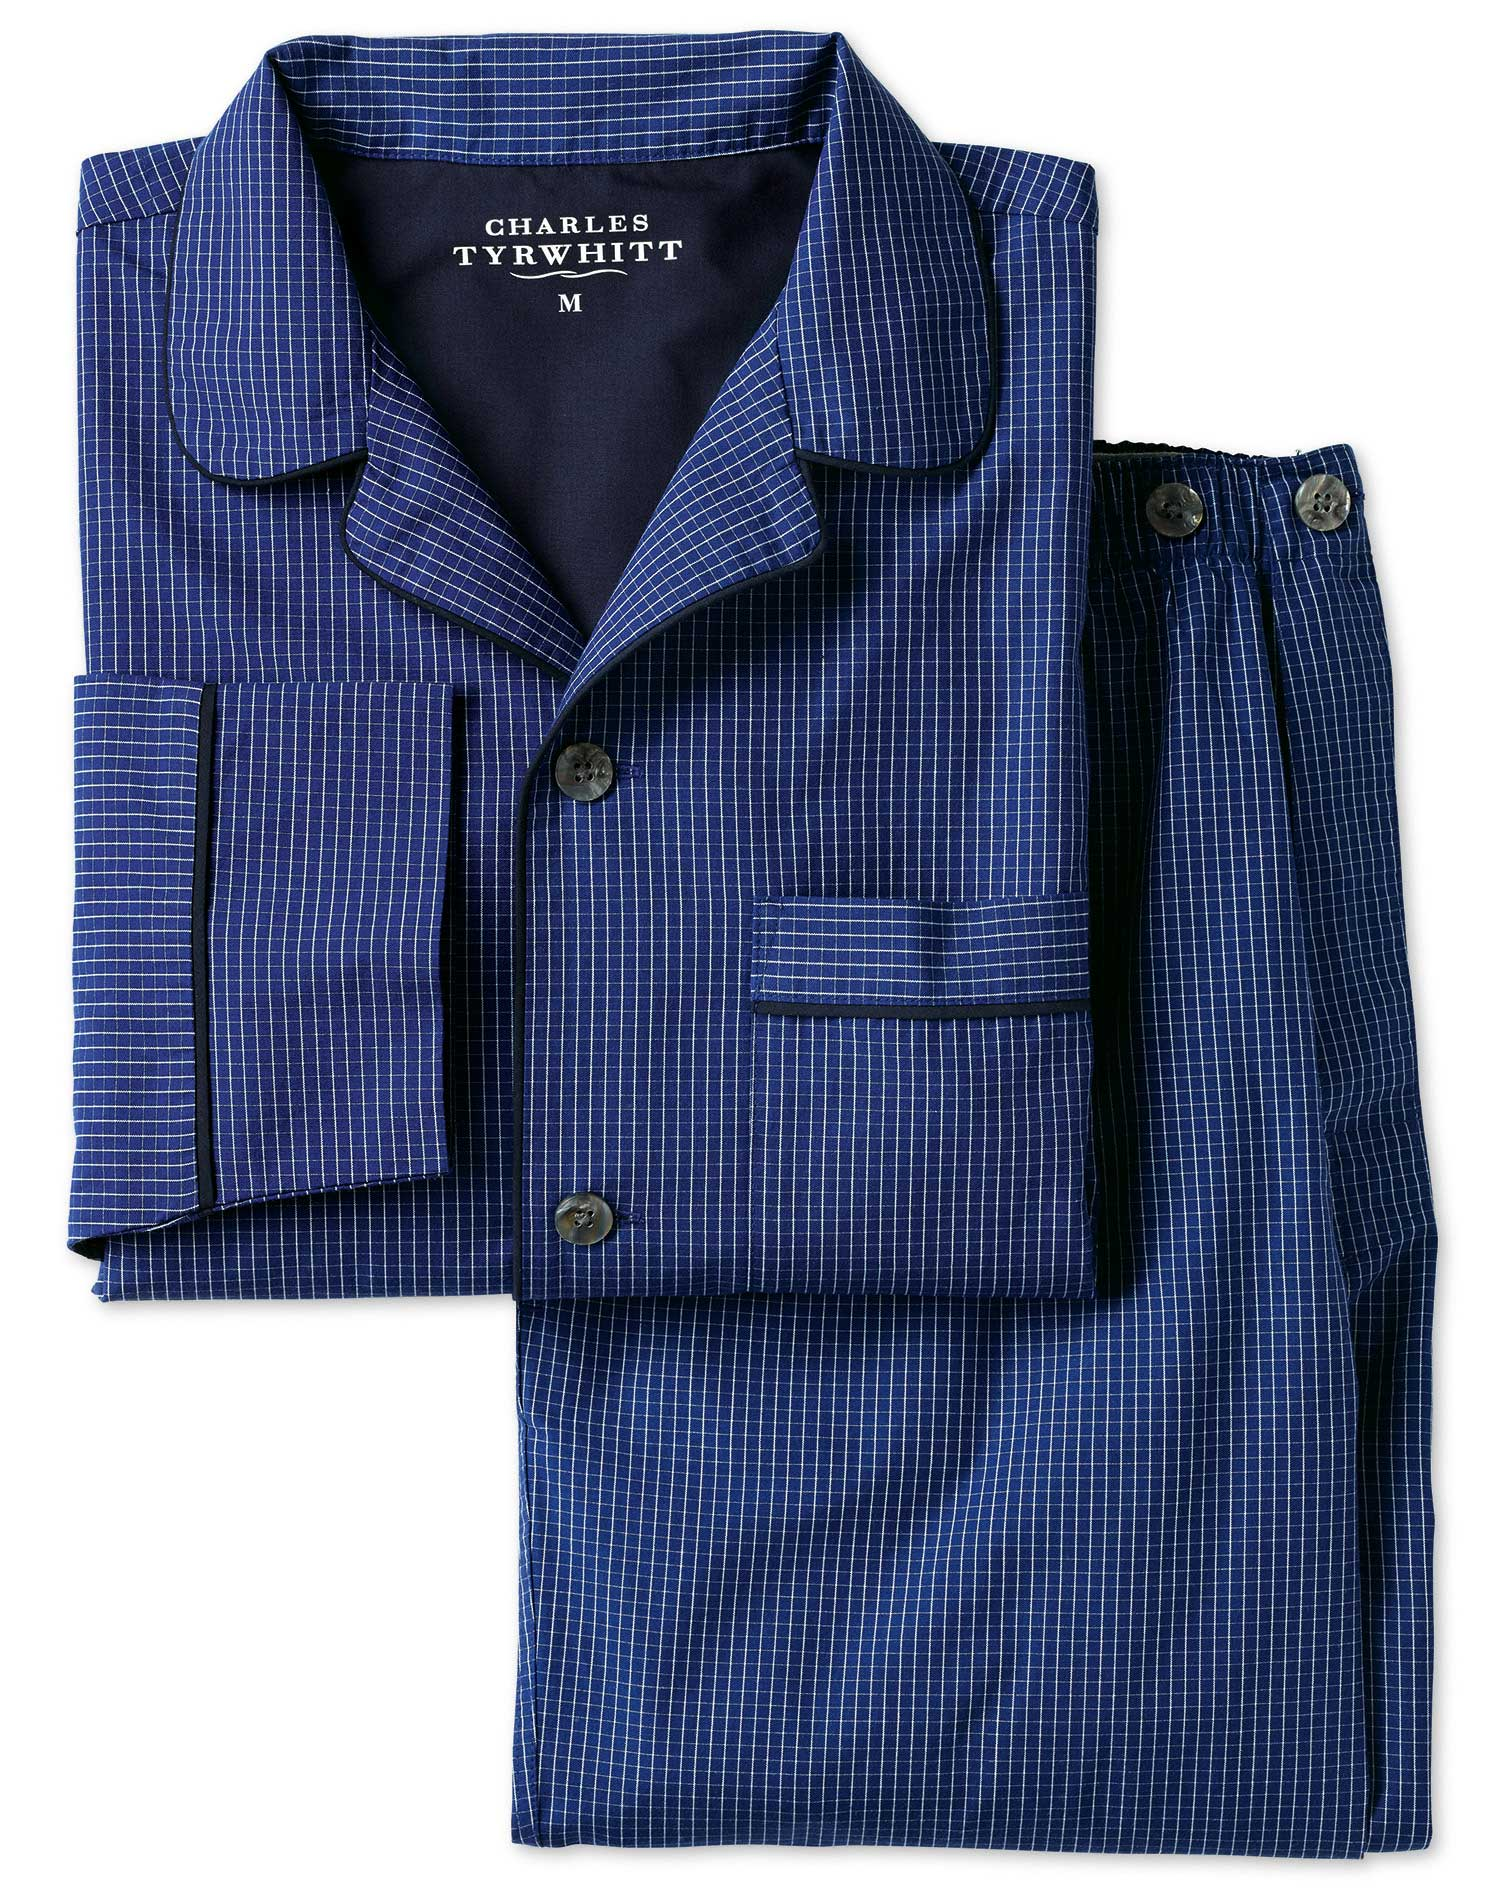 Blue Windowpane Check Pyjama Set Size Medium by Charles Tyrwhitt